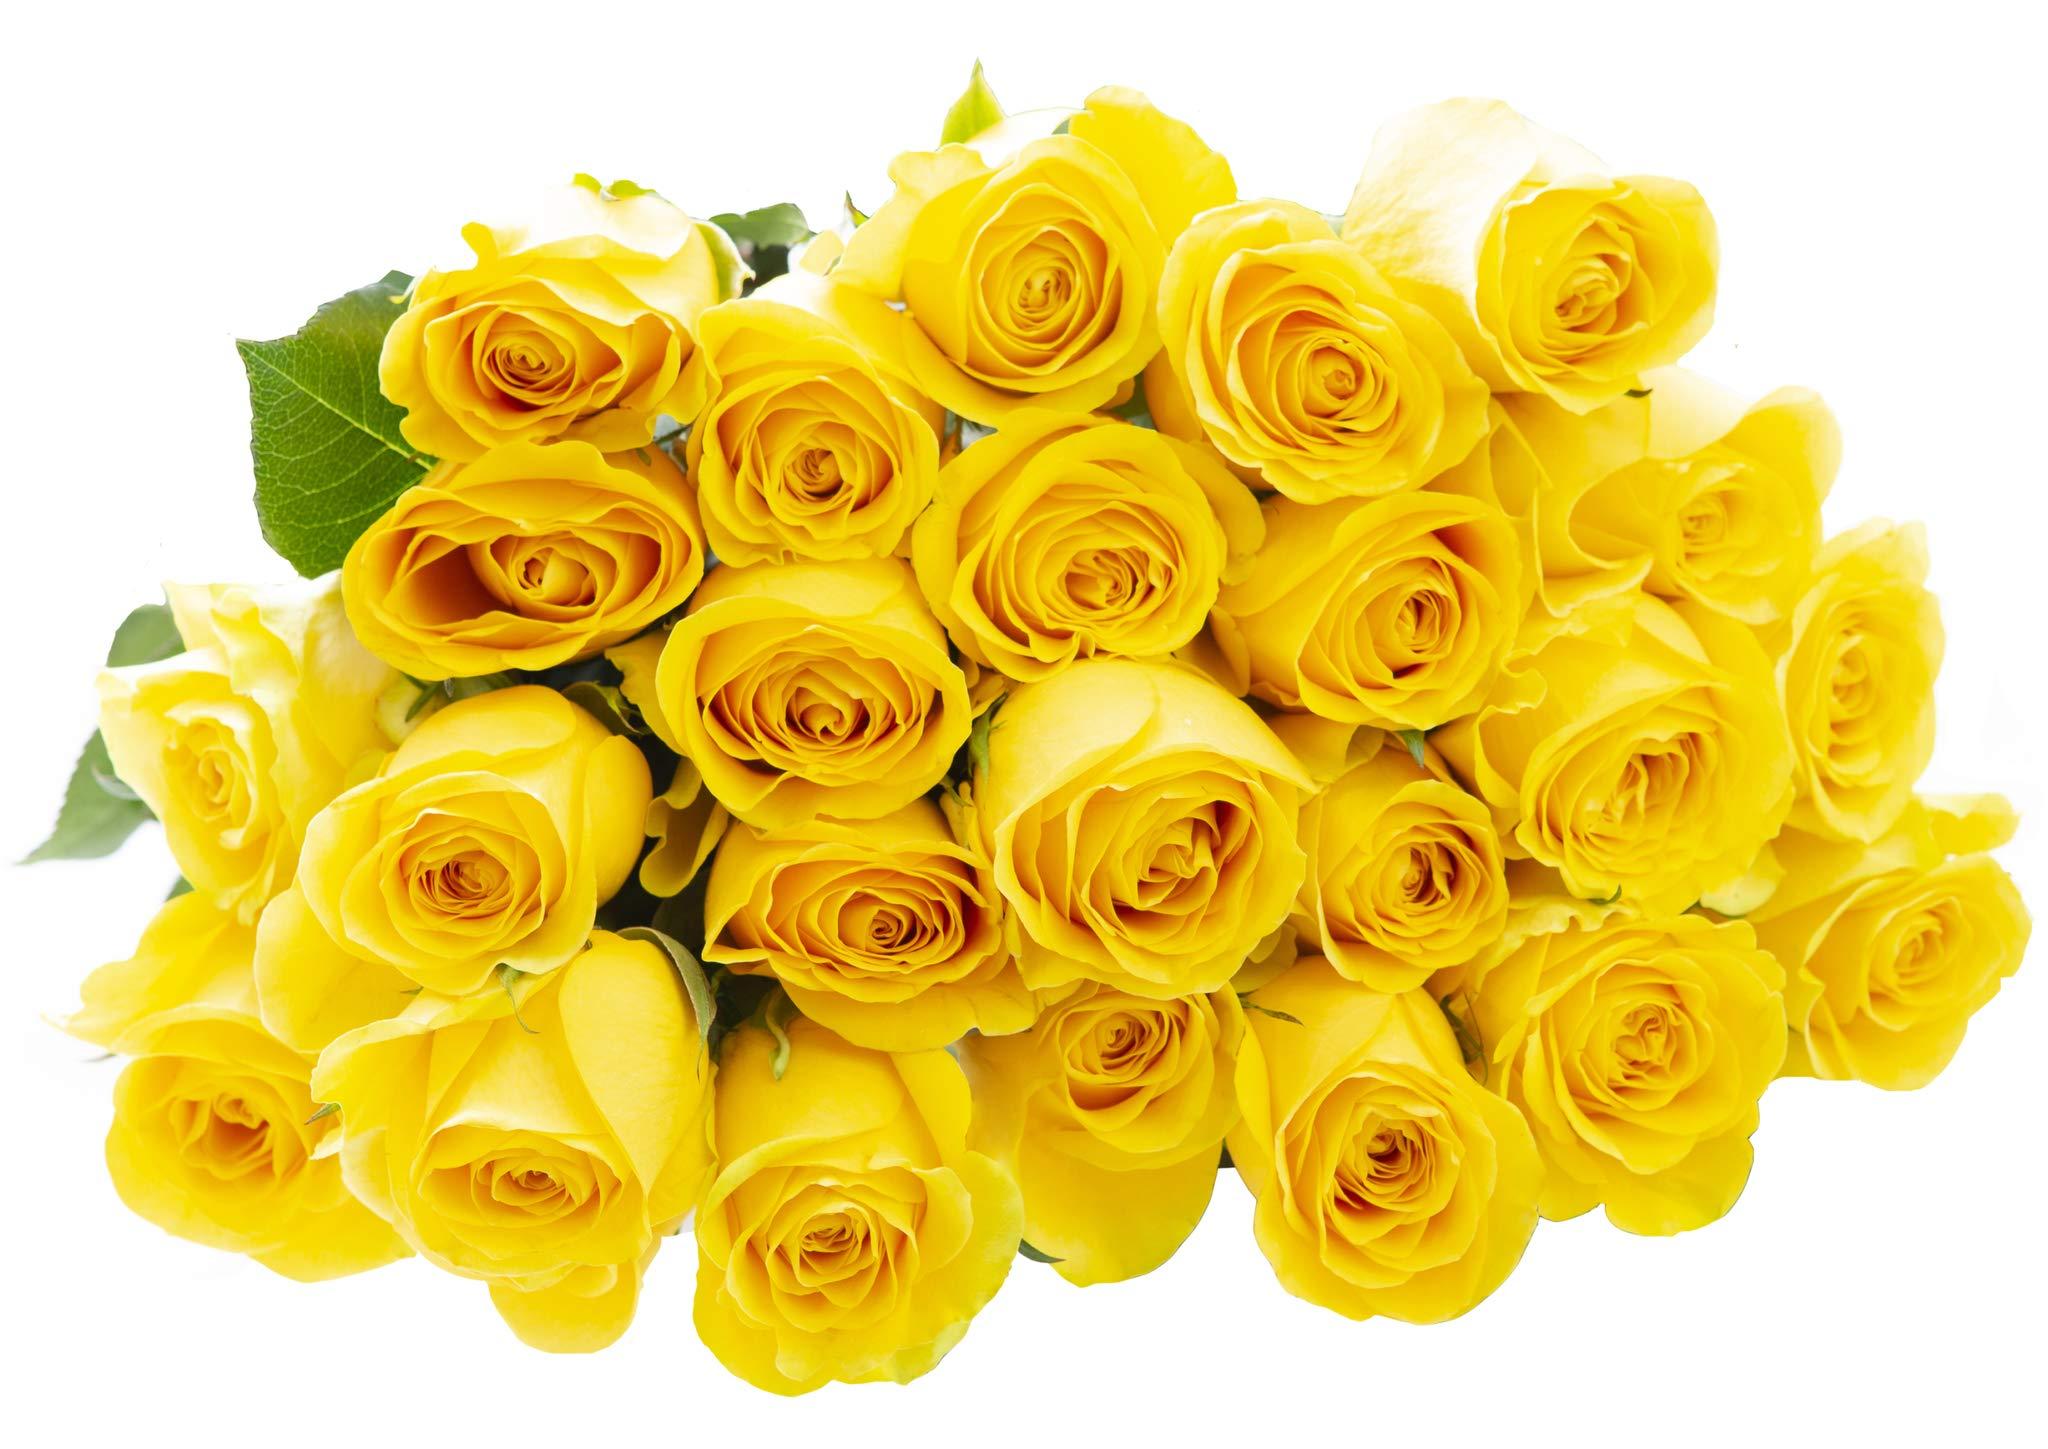 Blooms2Door 25 Yellow Roses (Farm-Fresh, Long Stem - 50cm) - Farm Direct Wholesale Fresh Flowers